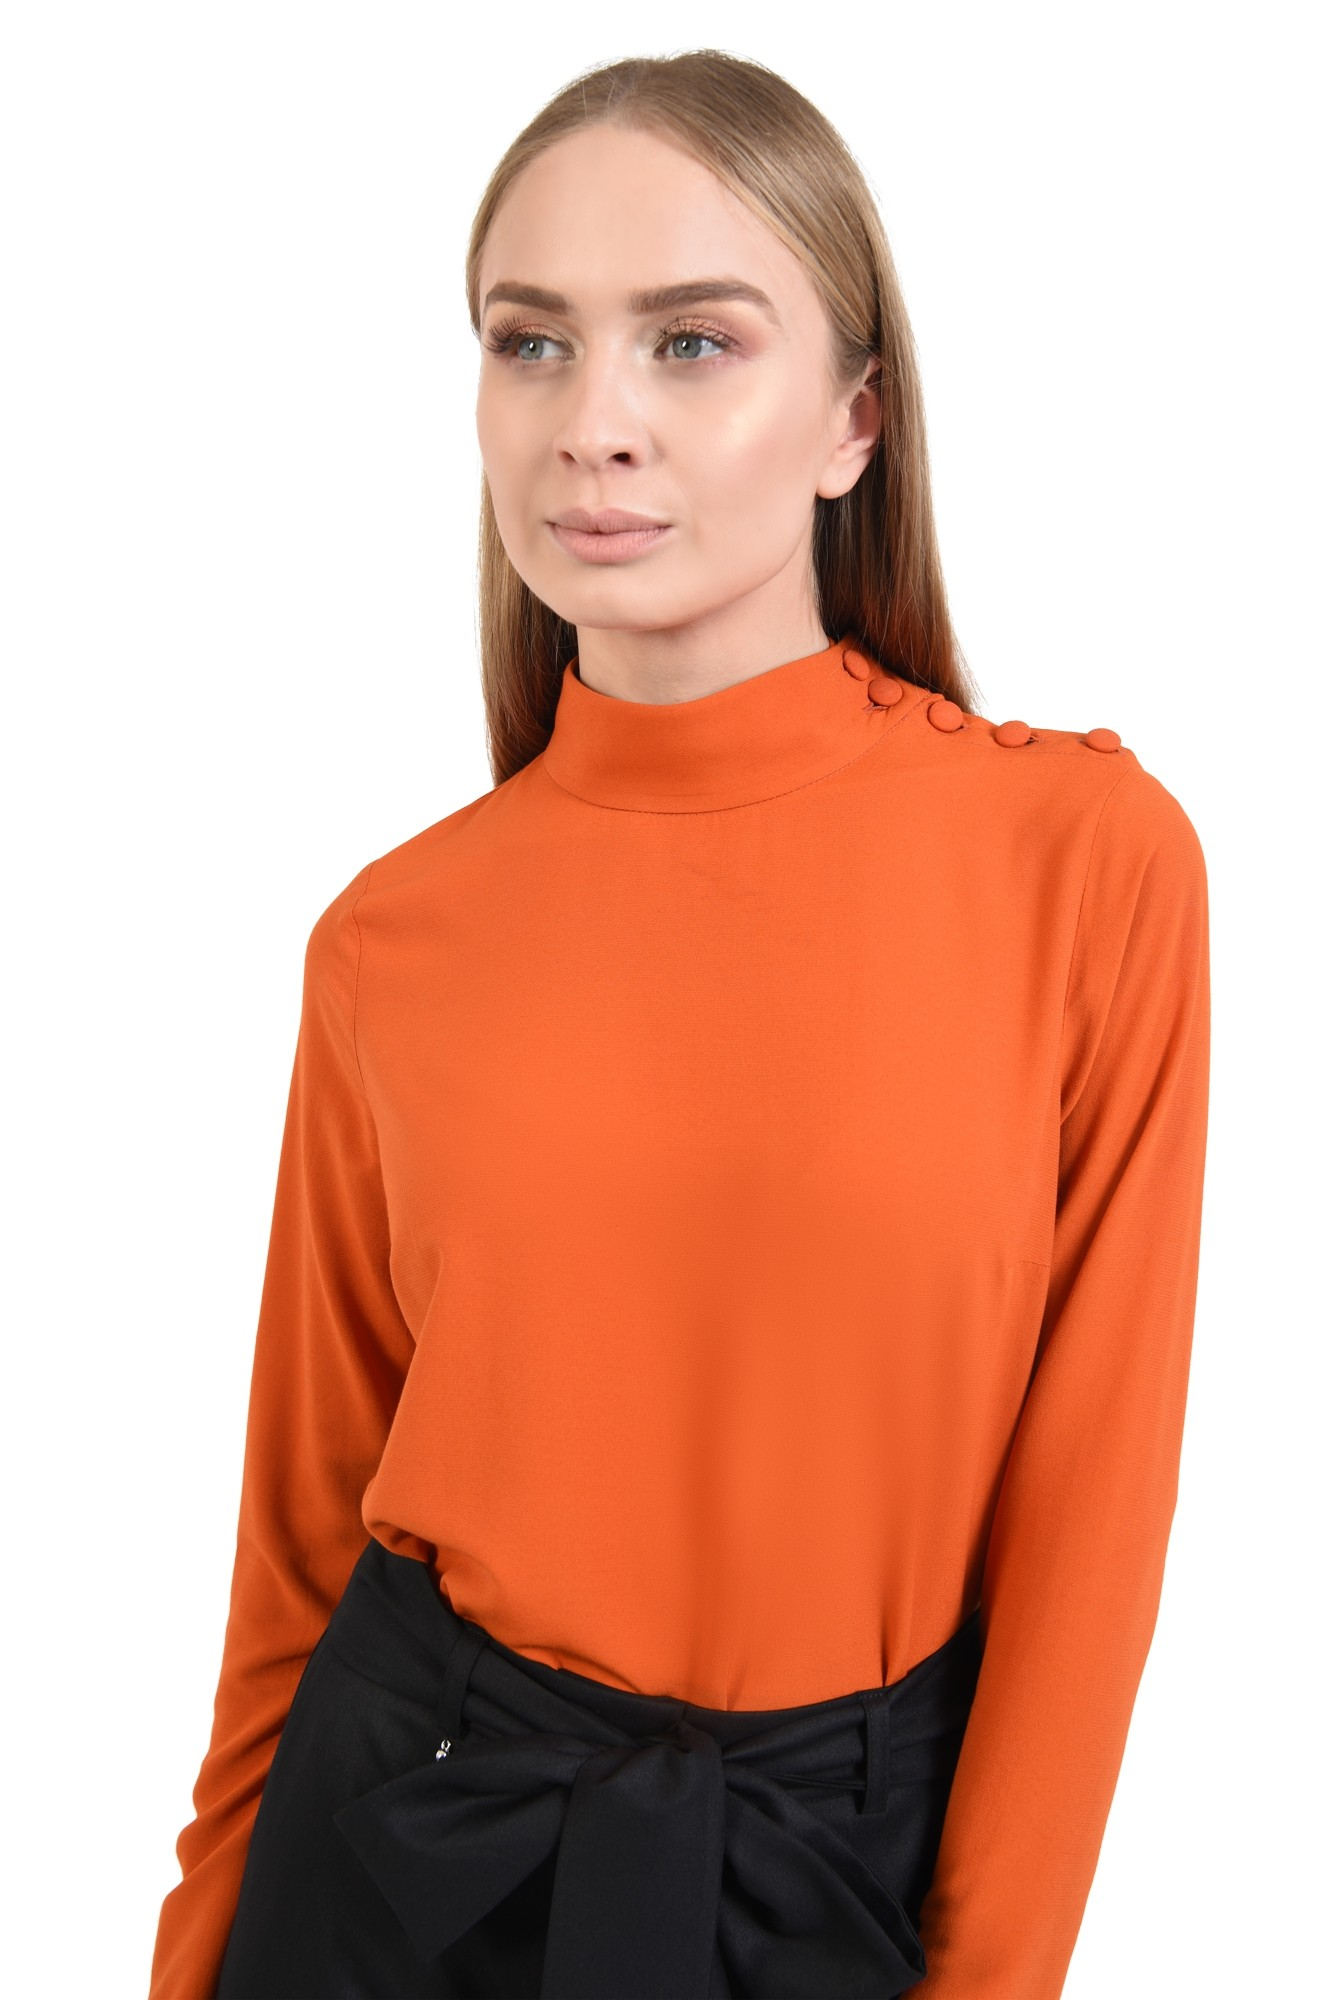 2 - bluza de zi, din sifon, maneci lungi, nasturi la umar, guler aplicat